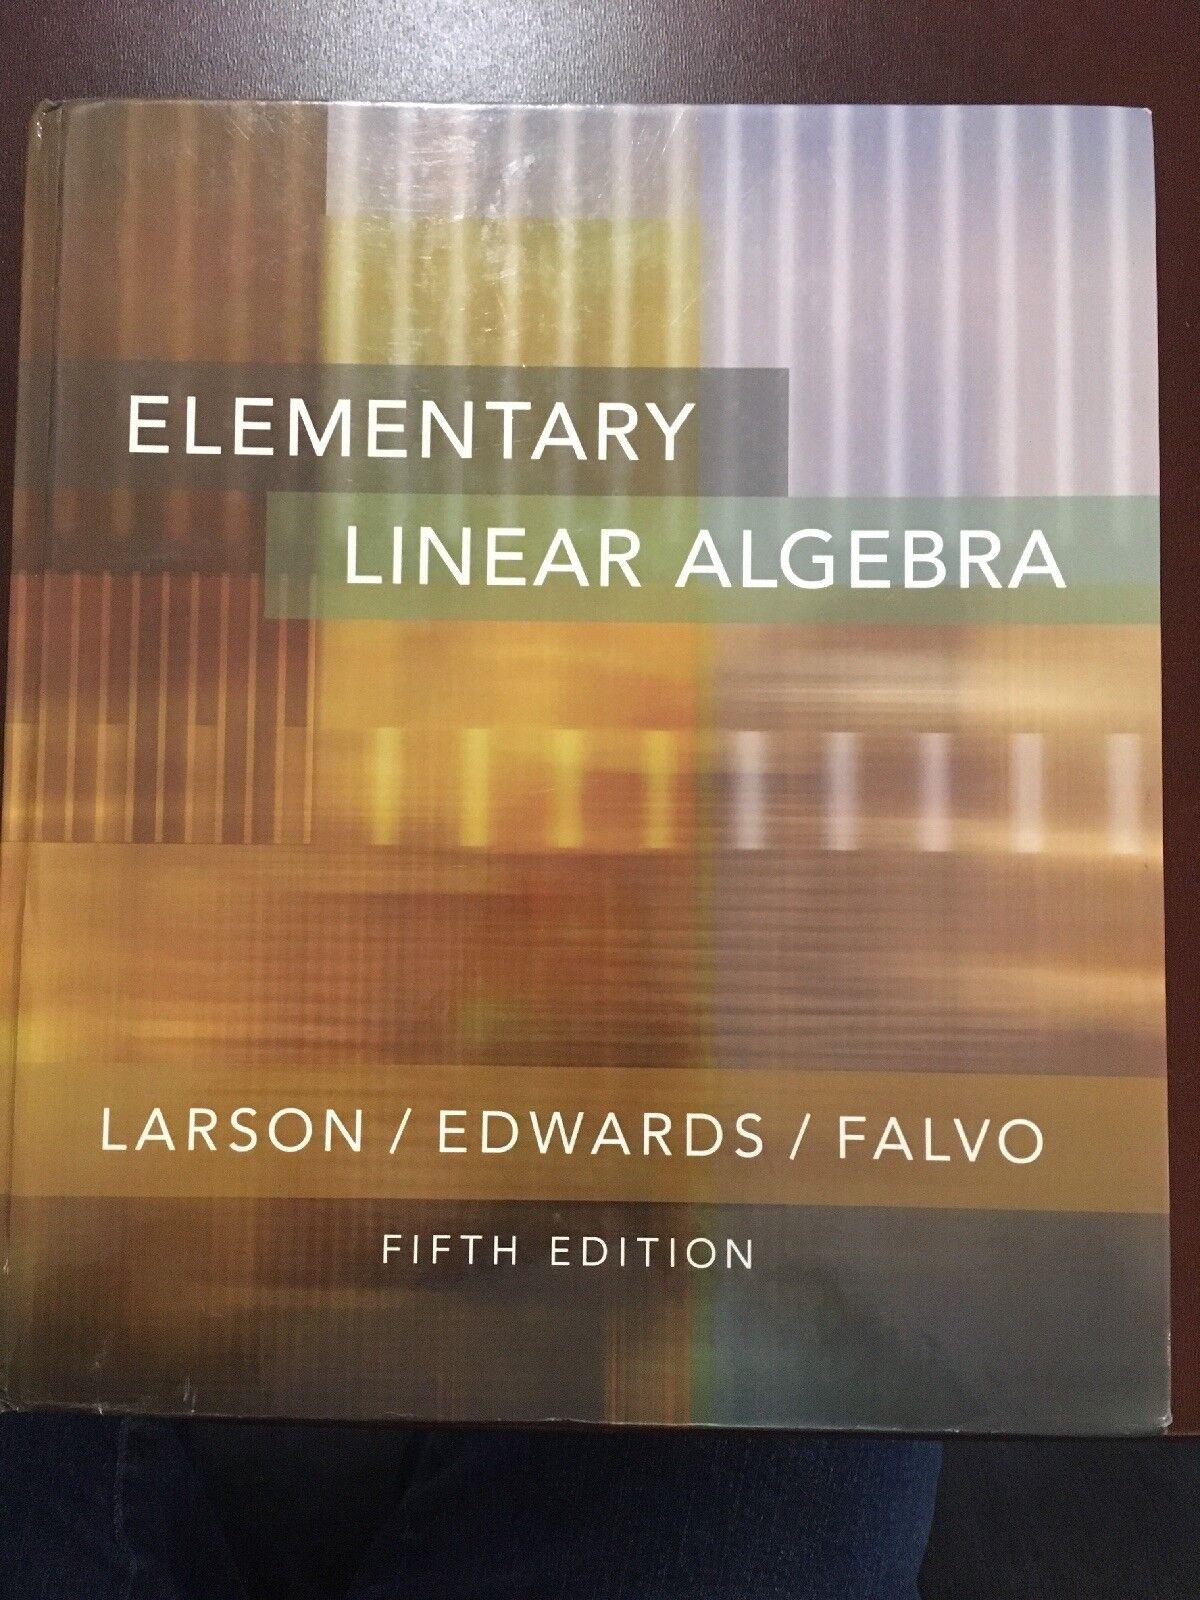 Elementary Linear Algebra by Ron Larson, David C. Falvo and Bruce H. Edwards  (2003, Hardcover) | eBay